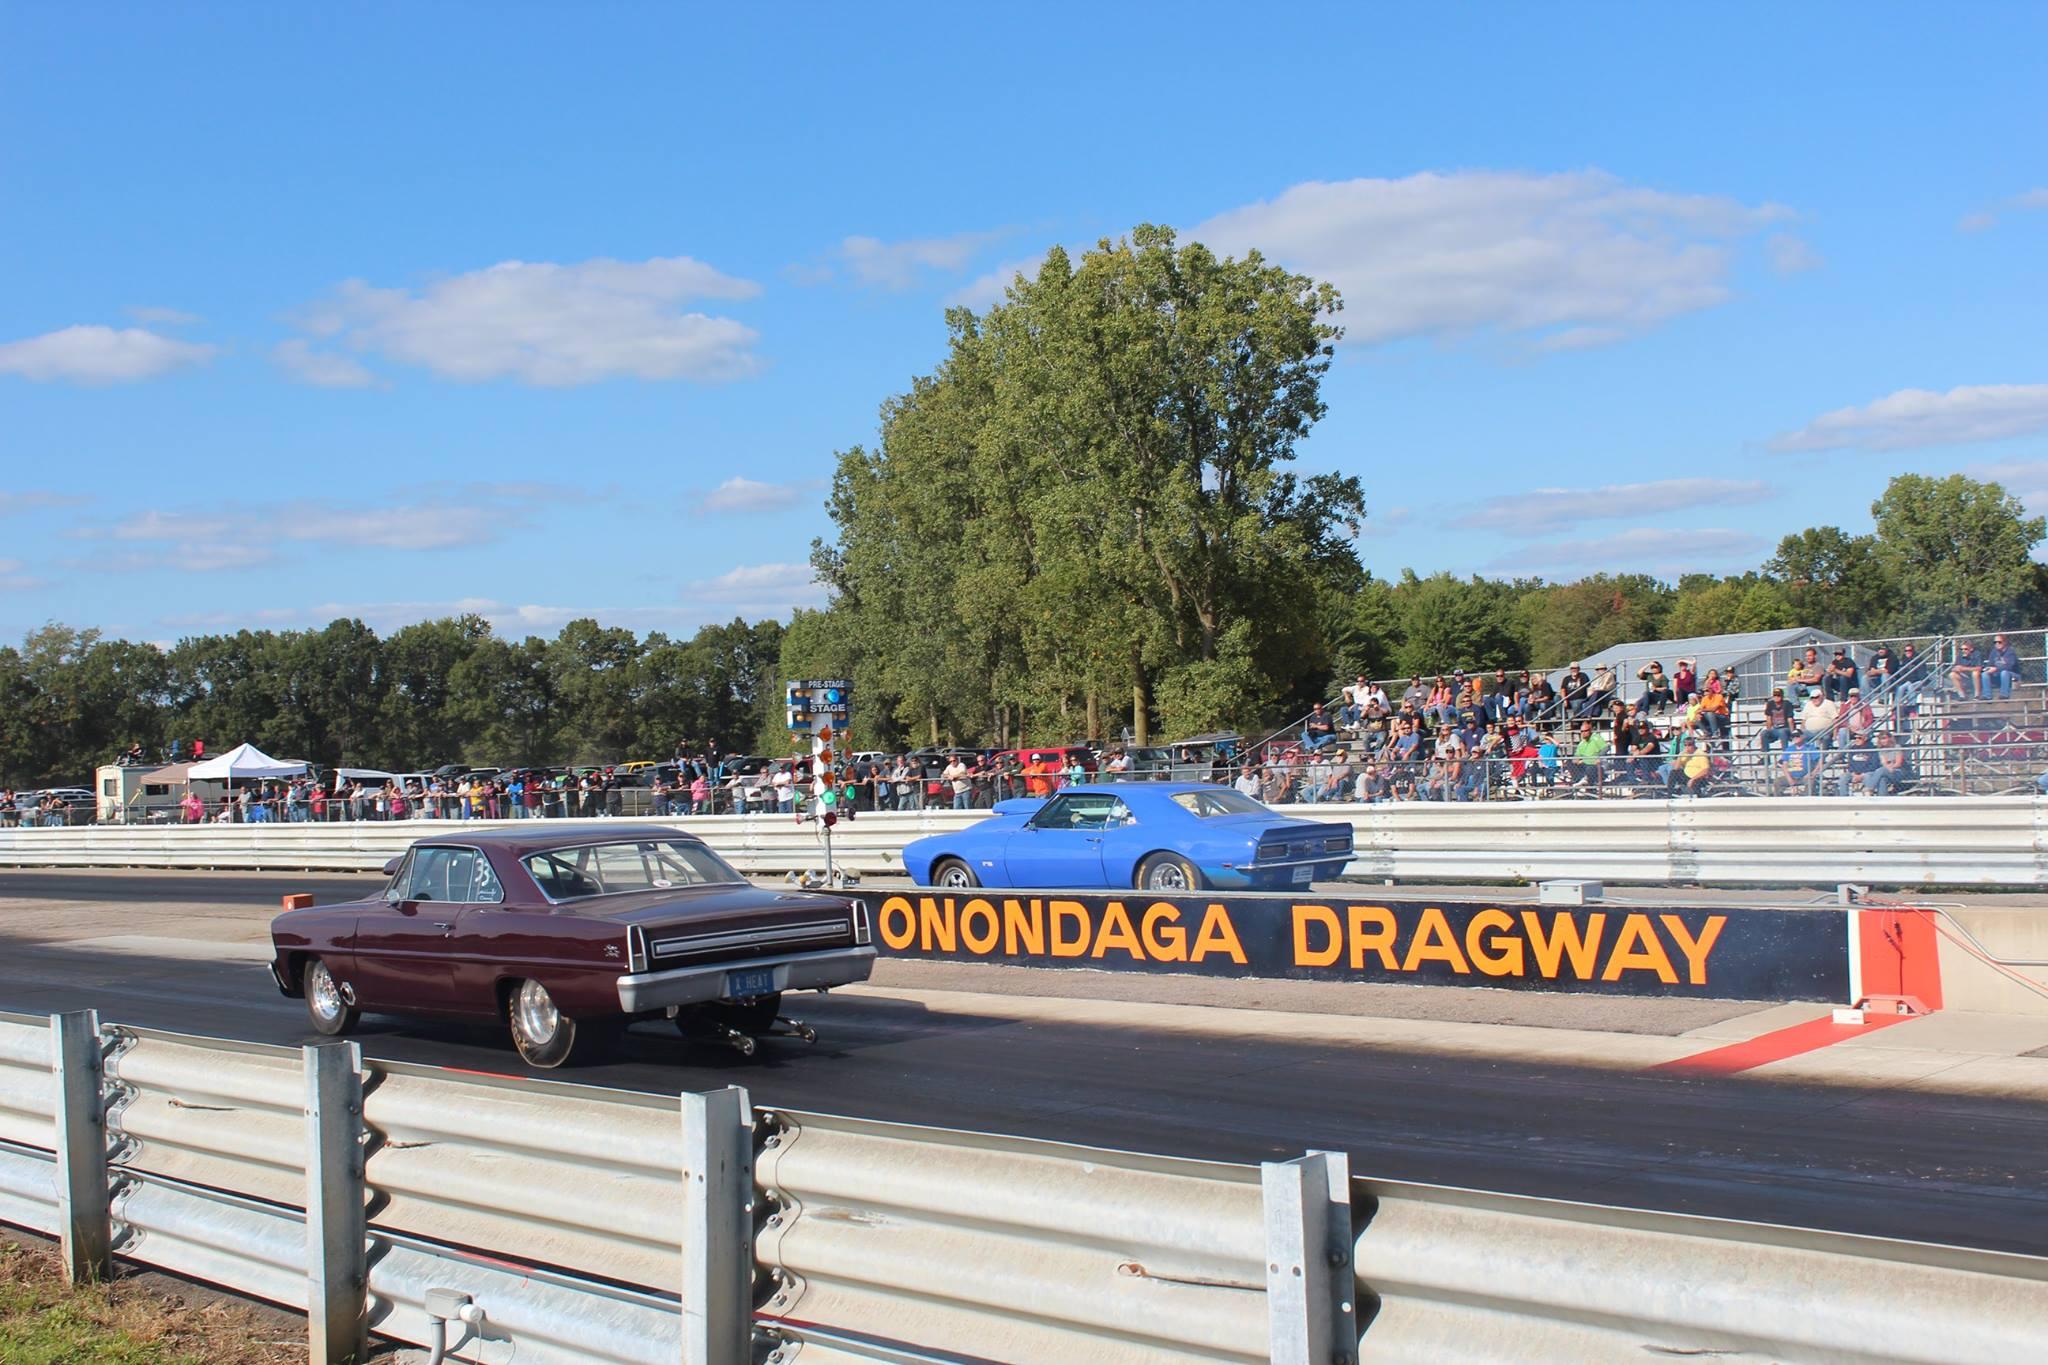 Onondaga Dragway rear view strip